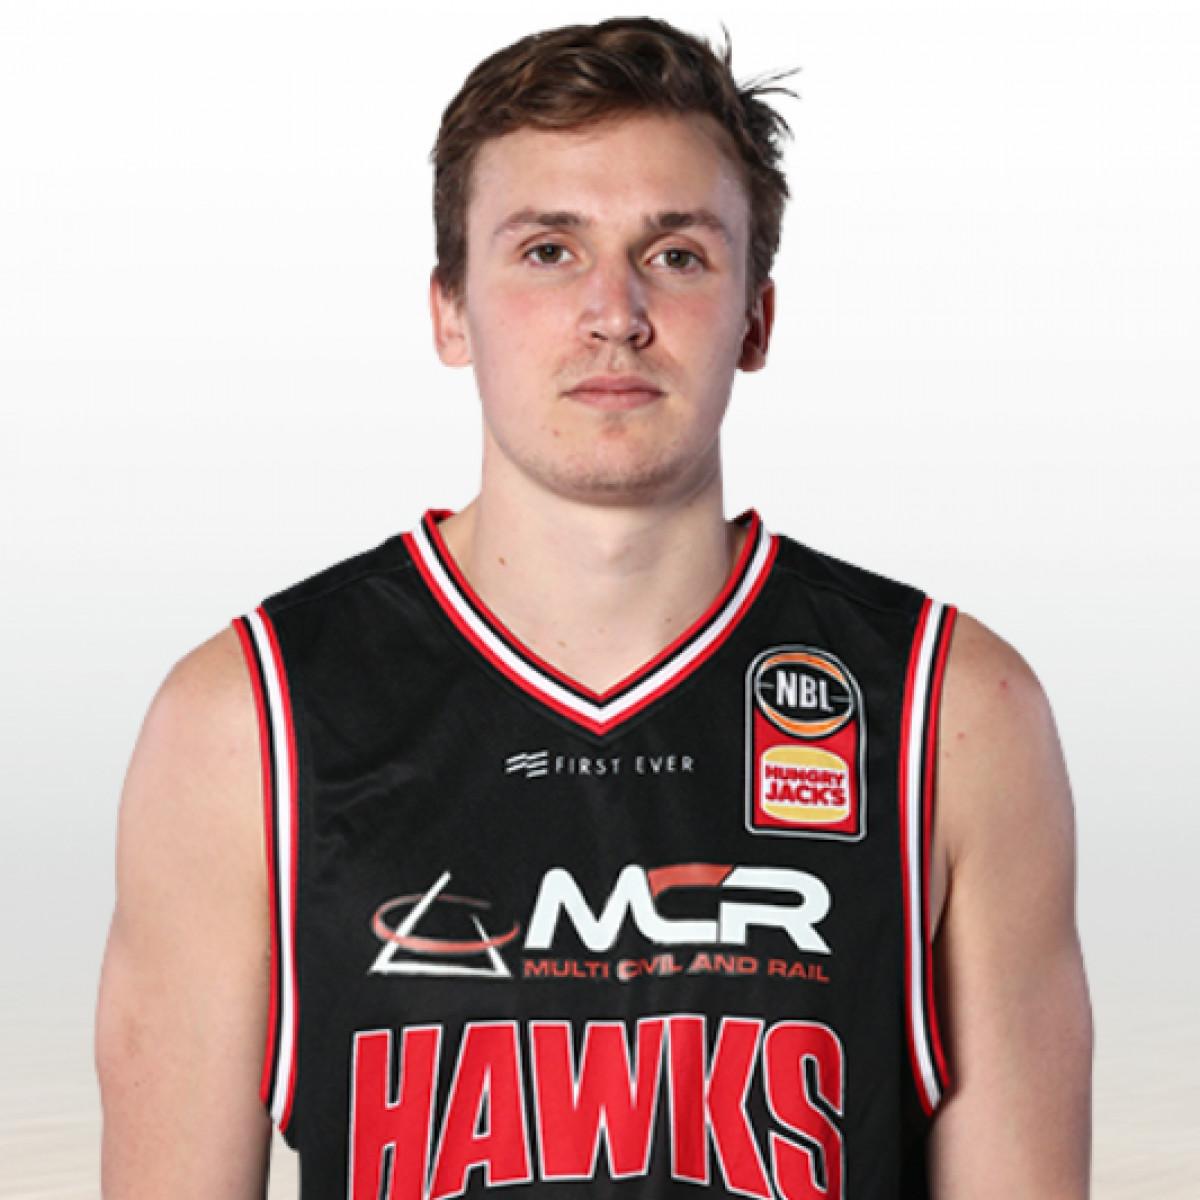 Photo of Emmett Naar, 2019-2020 season